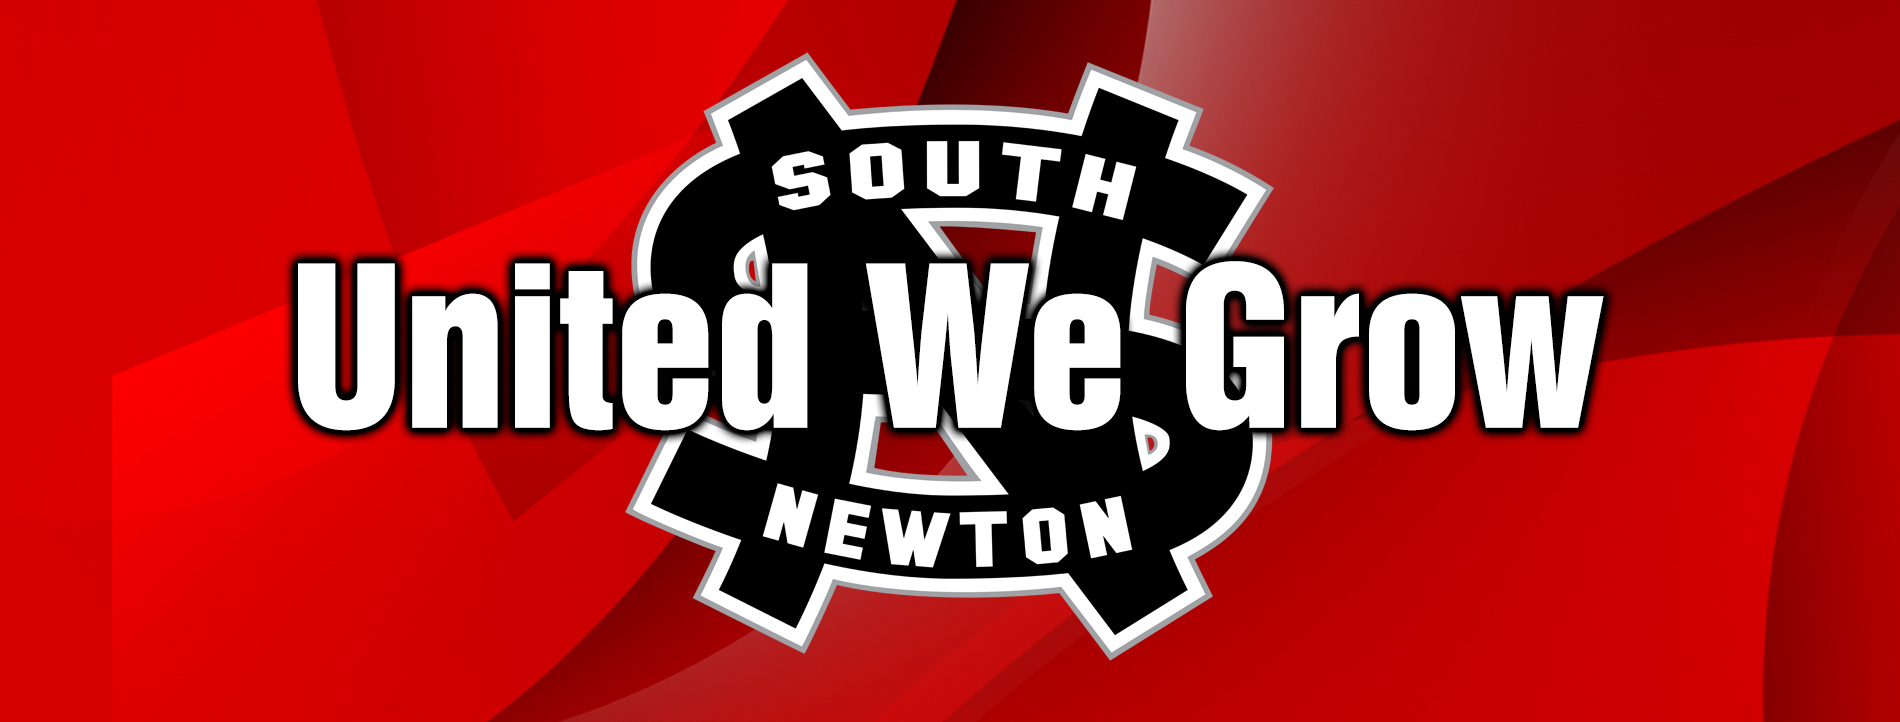 United we grow